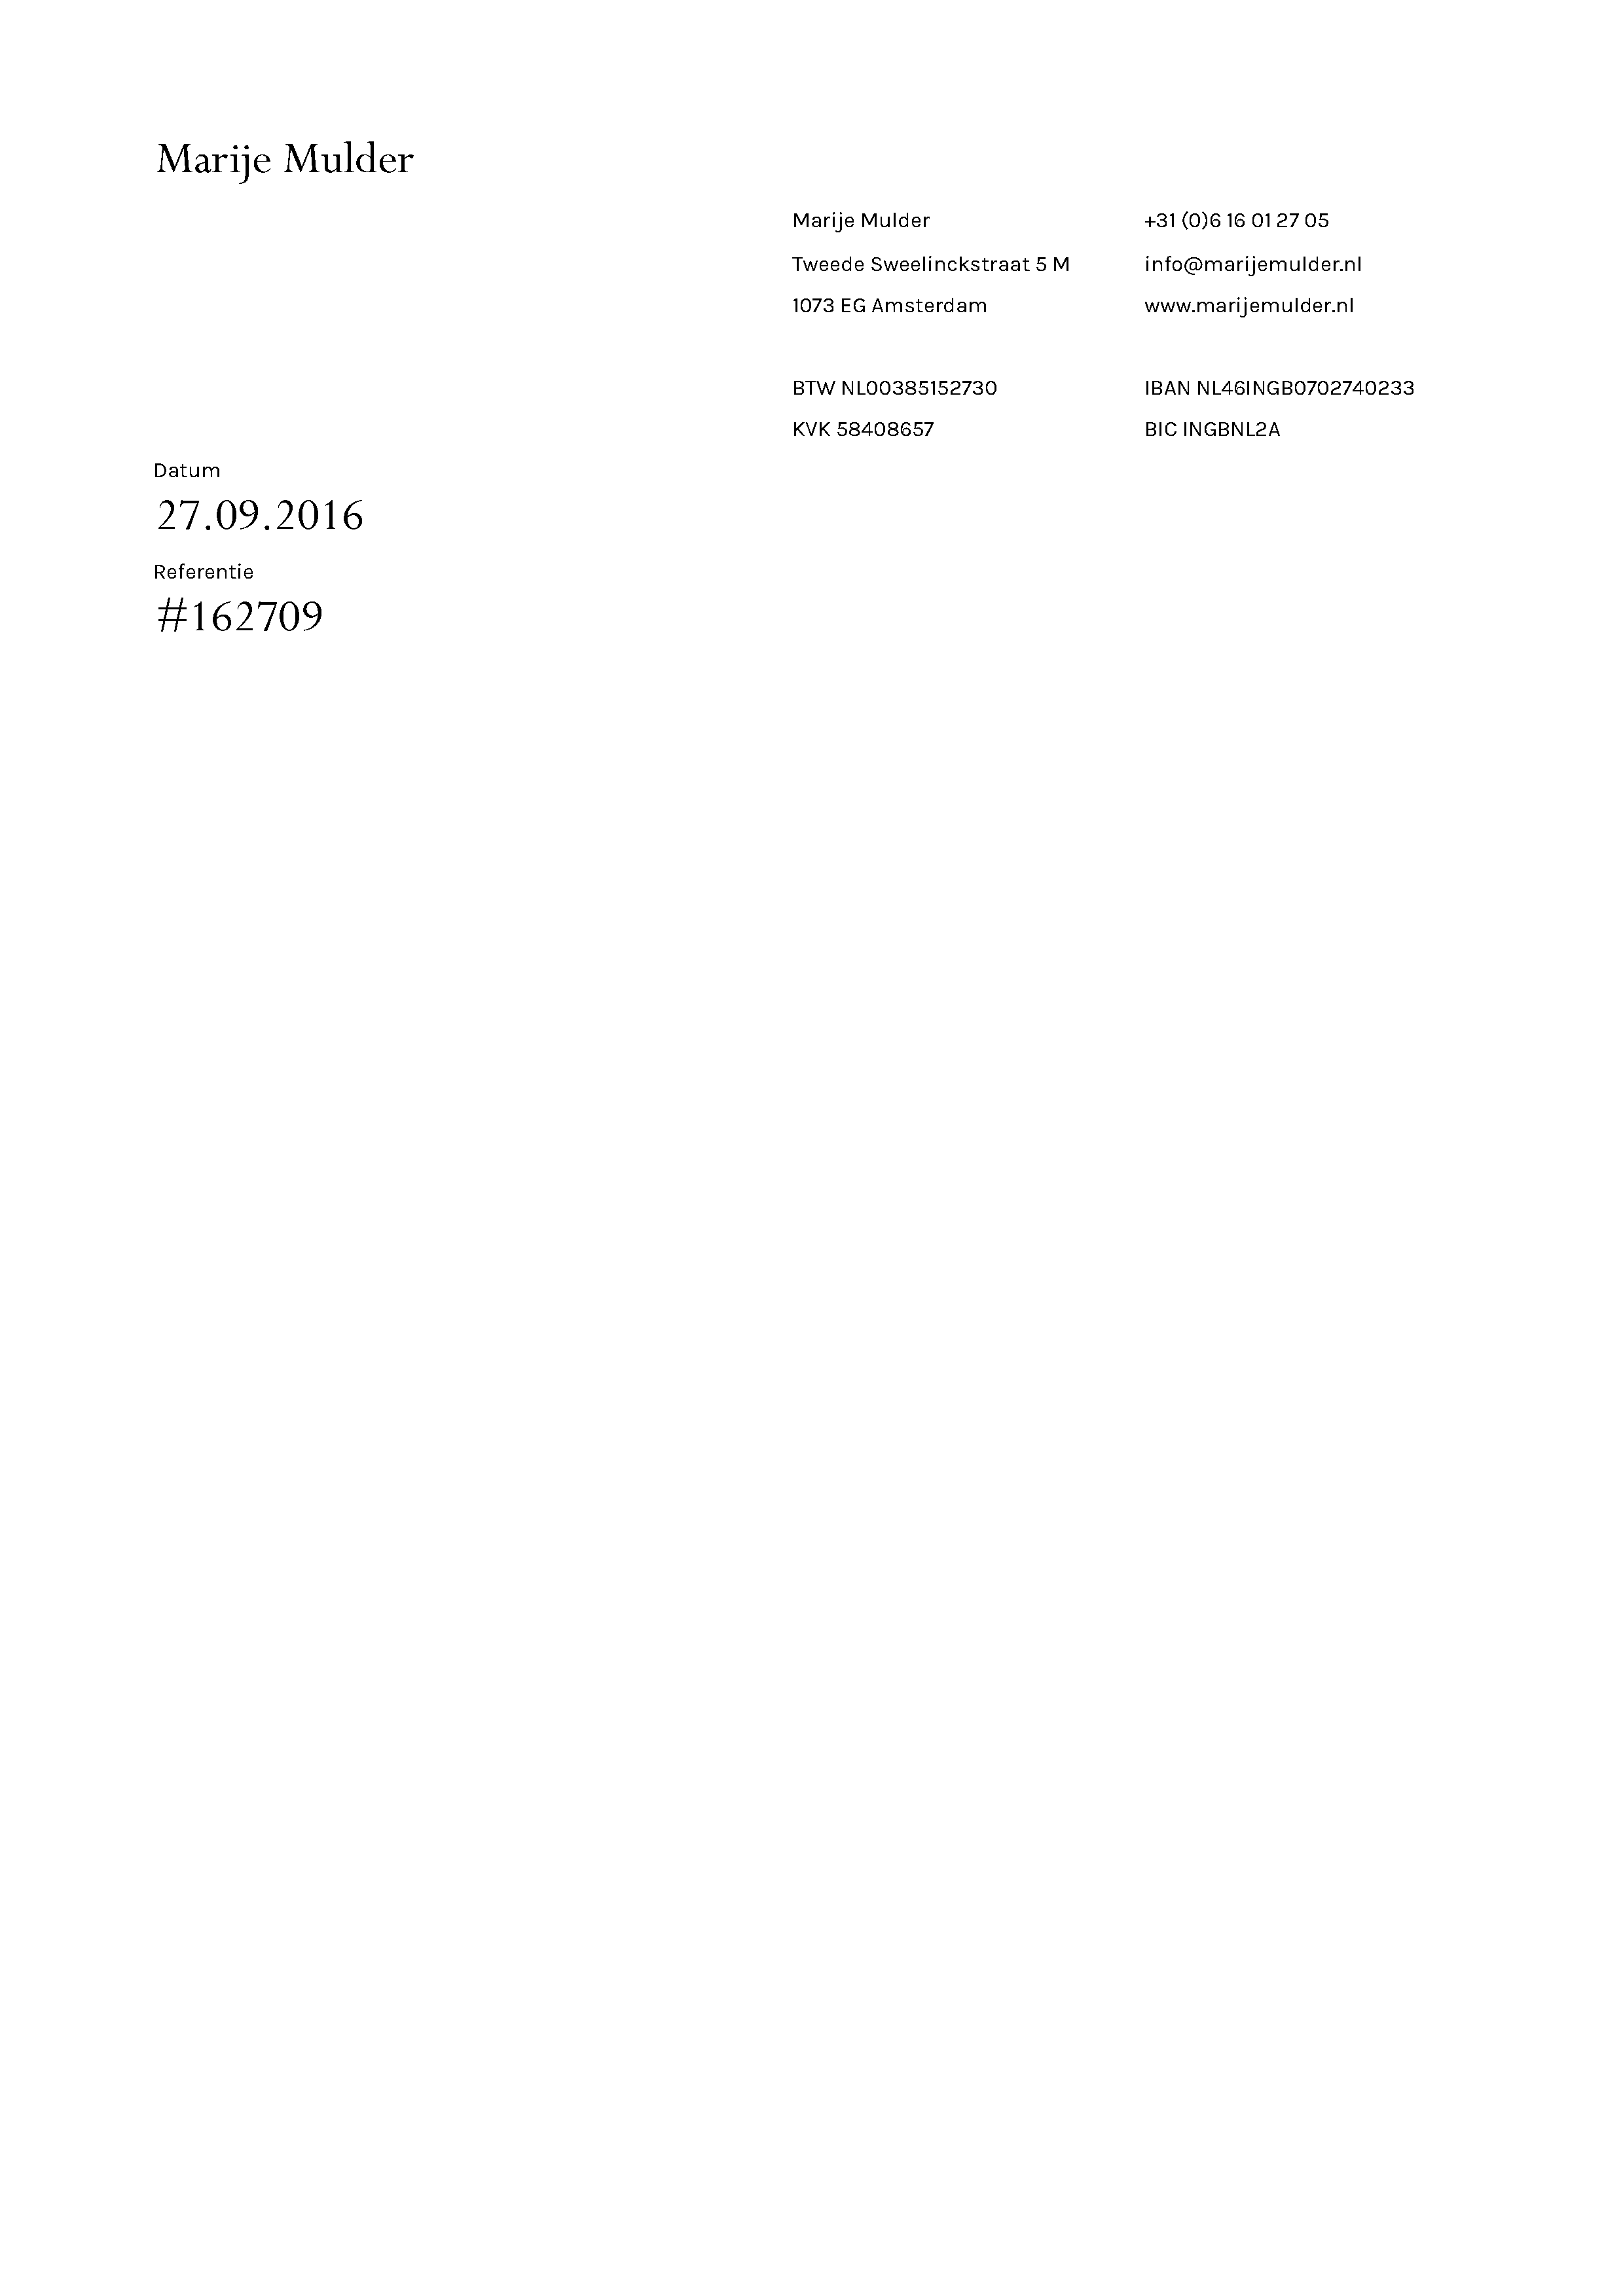 marije-mulder-document